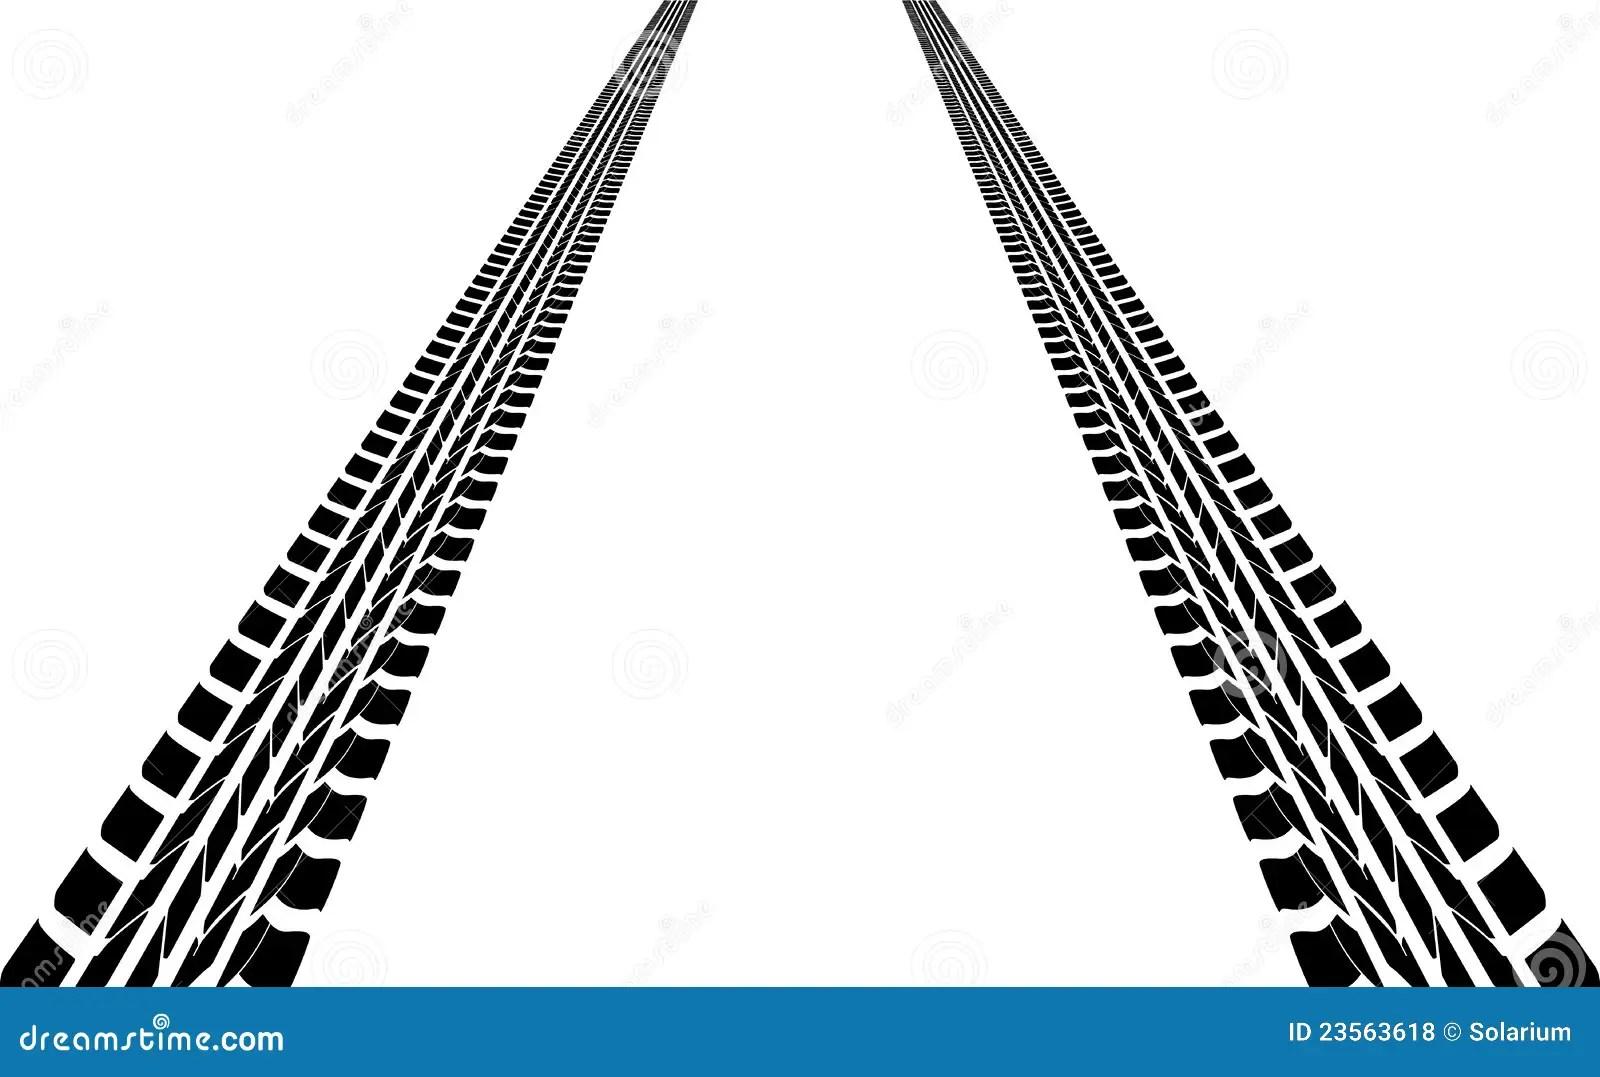 Tire tracks stock vector. Illustration of fast, both